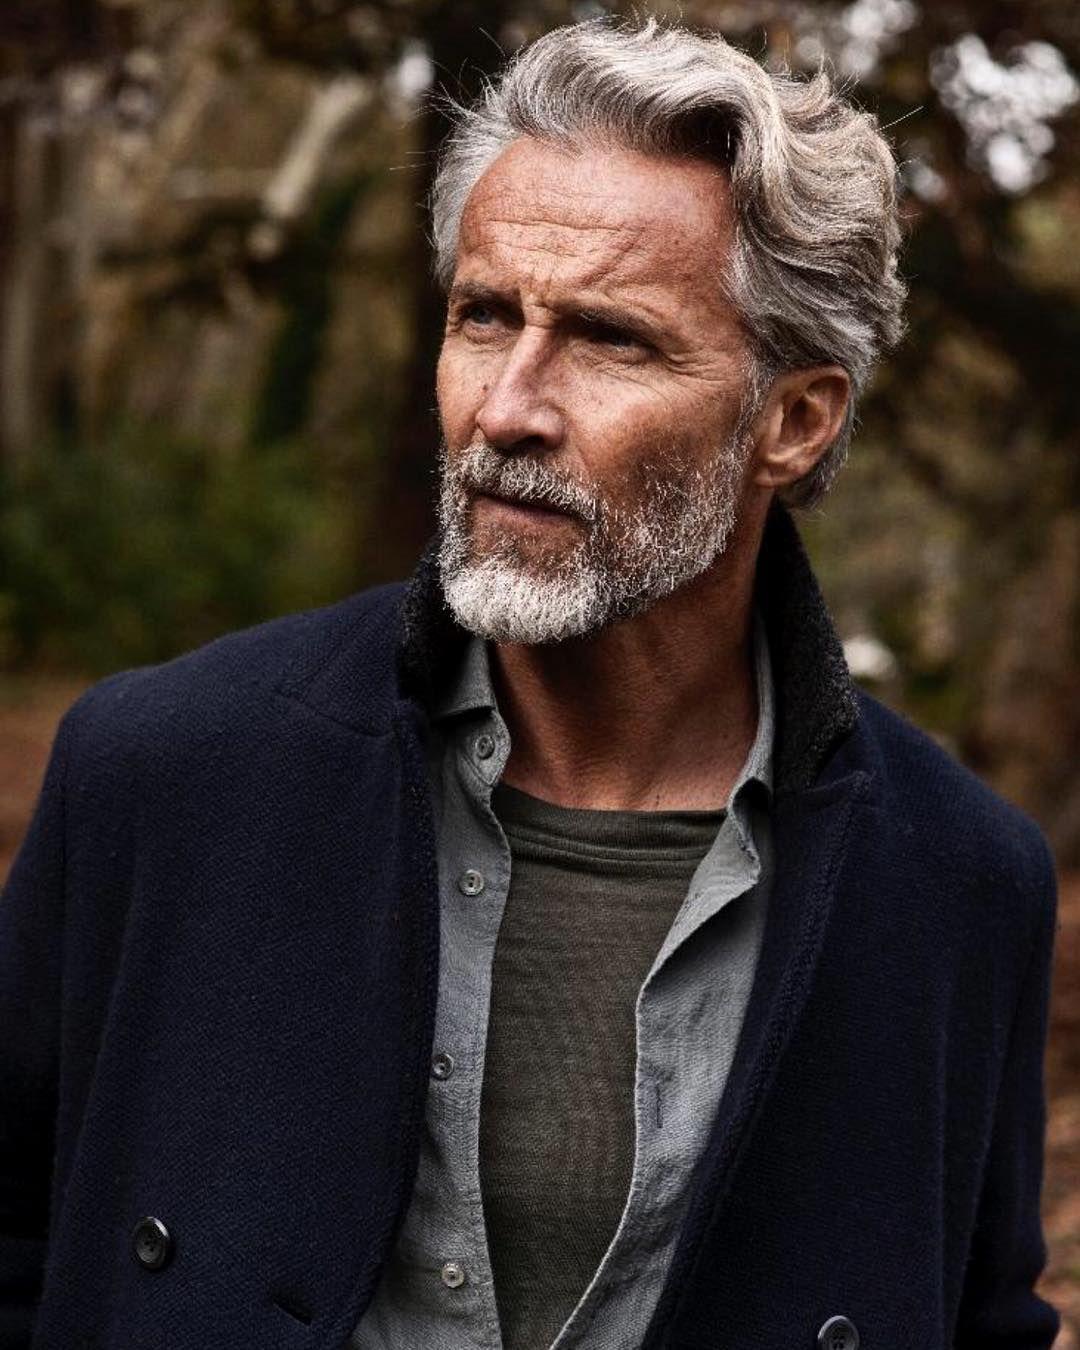 sɴɪᴇɢᴅᴇᴊᴀ ☆ Ben Desombre | model | silver fox | Grey hair men, White hair  men, Older mens hairstyles